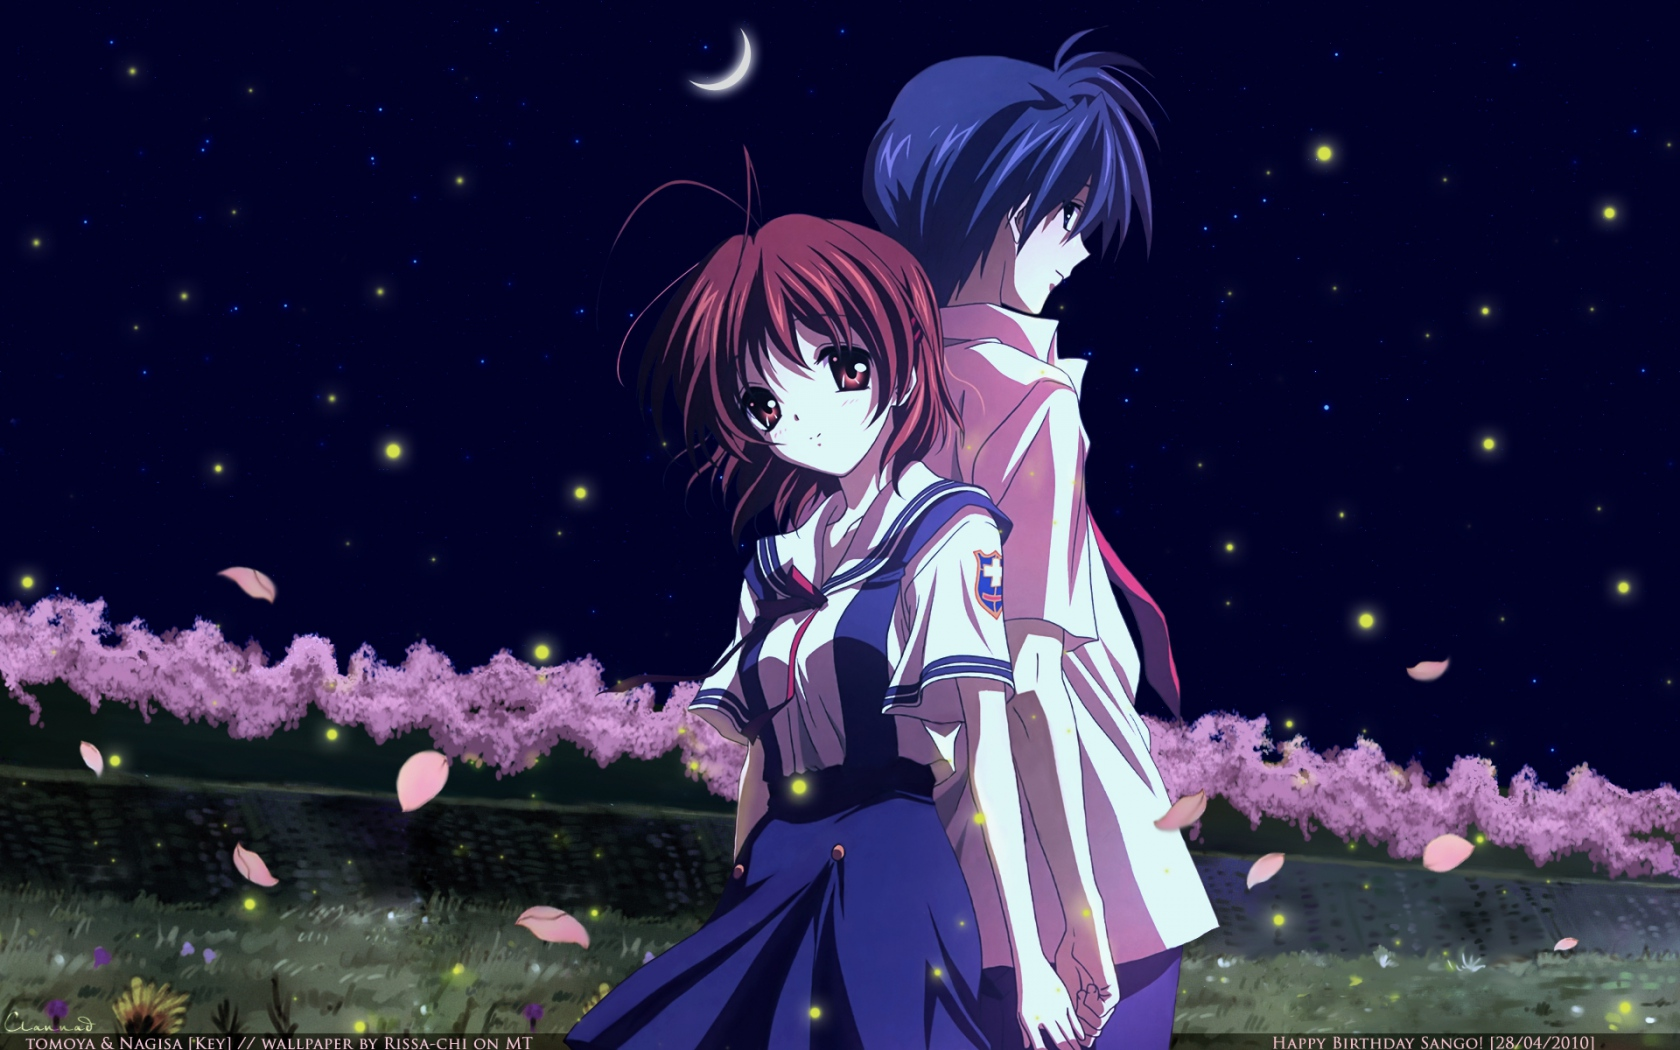 Tomoya and Nagisa - To...